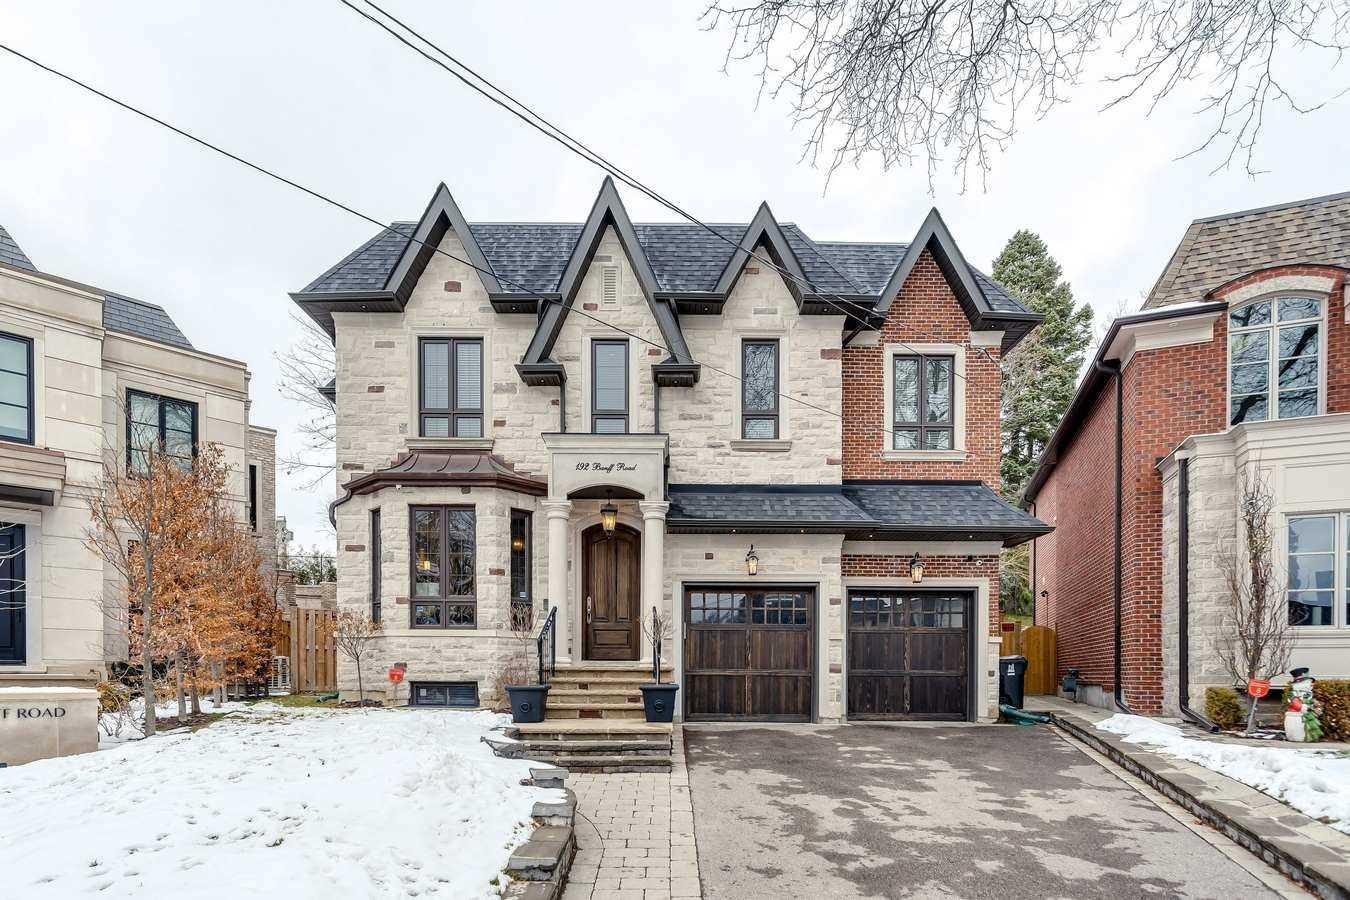 192 Banff Rd, Toronto, Ontario M4P2R2, 4 Bedrooms Bedrooms, 10 Rooms Rooms,6 BathroomsBathrooms,Detached,For Sale,Banff,C5081607